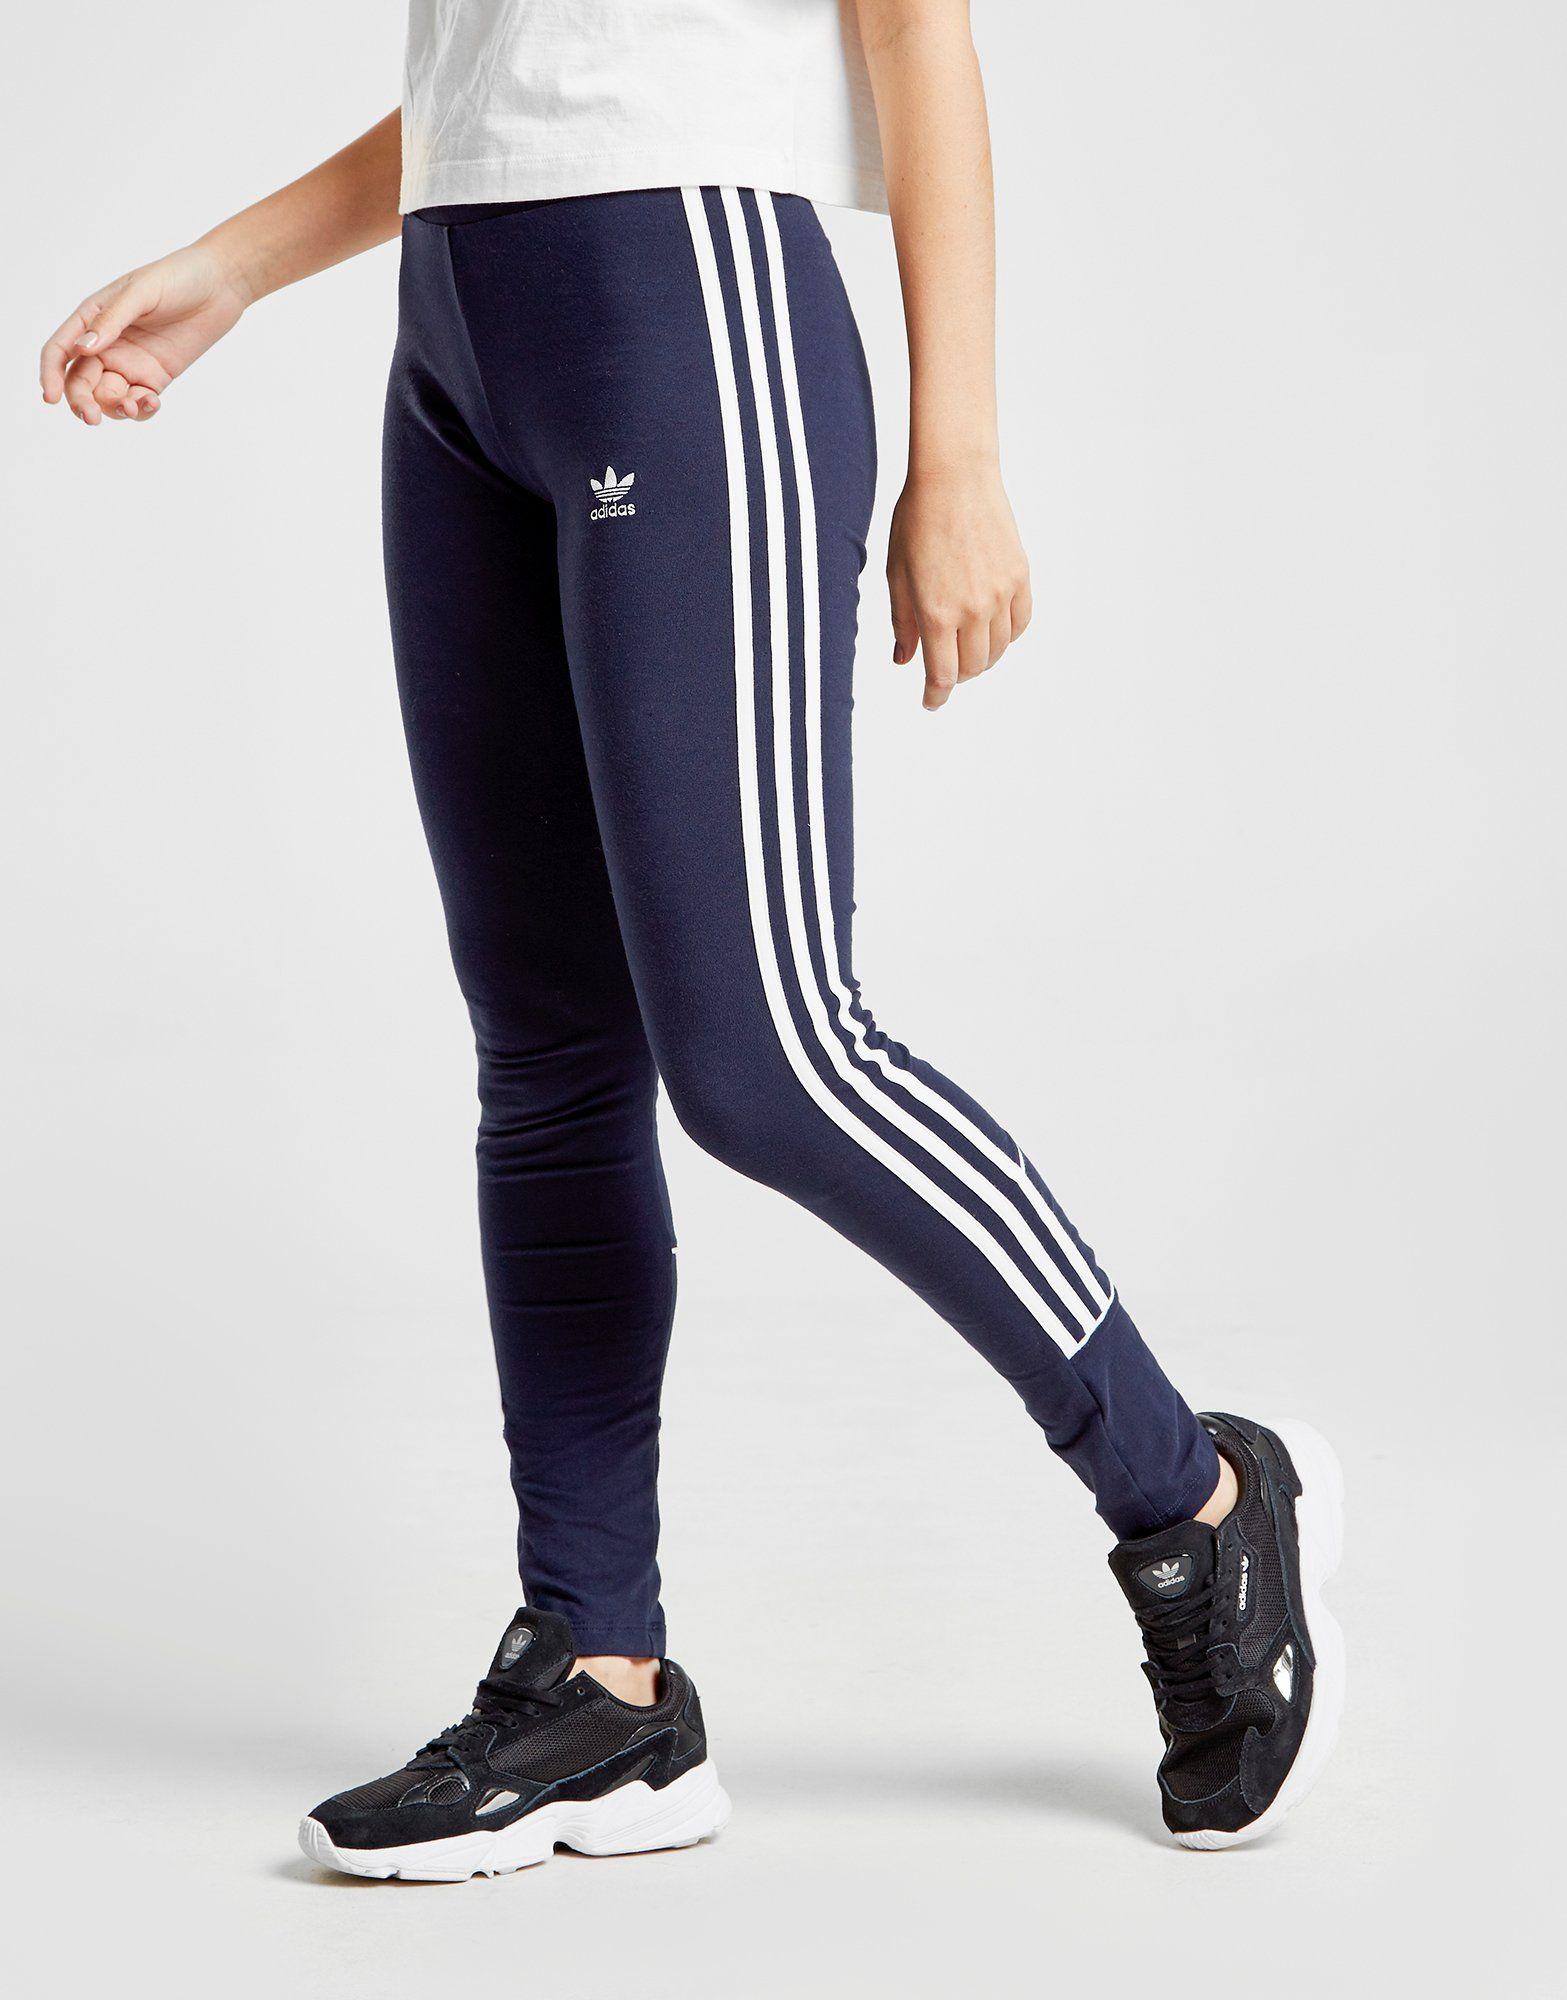 adidas Originals 3-Stripes Piping Leggings